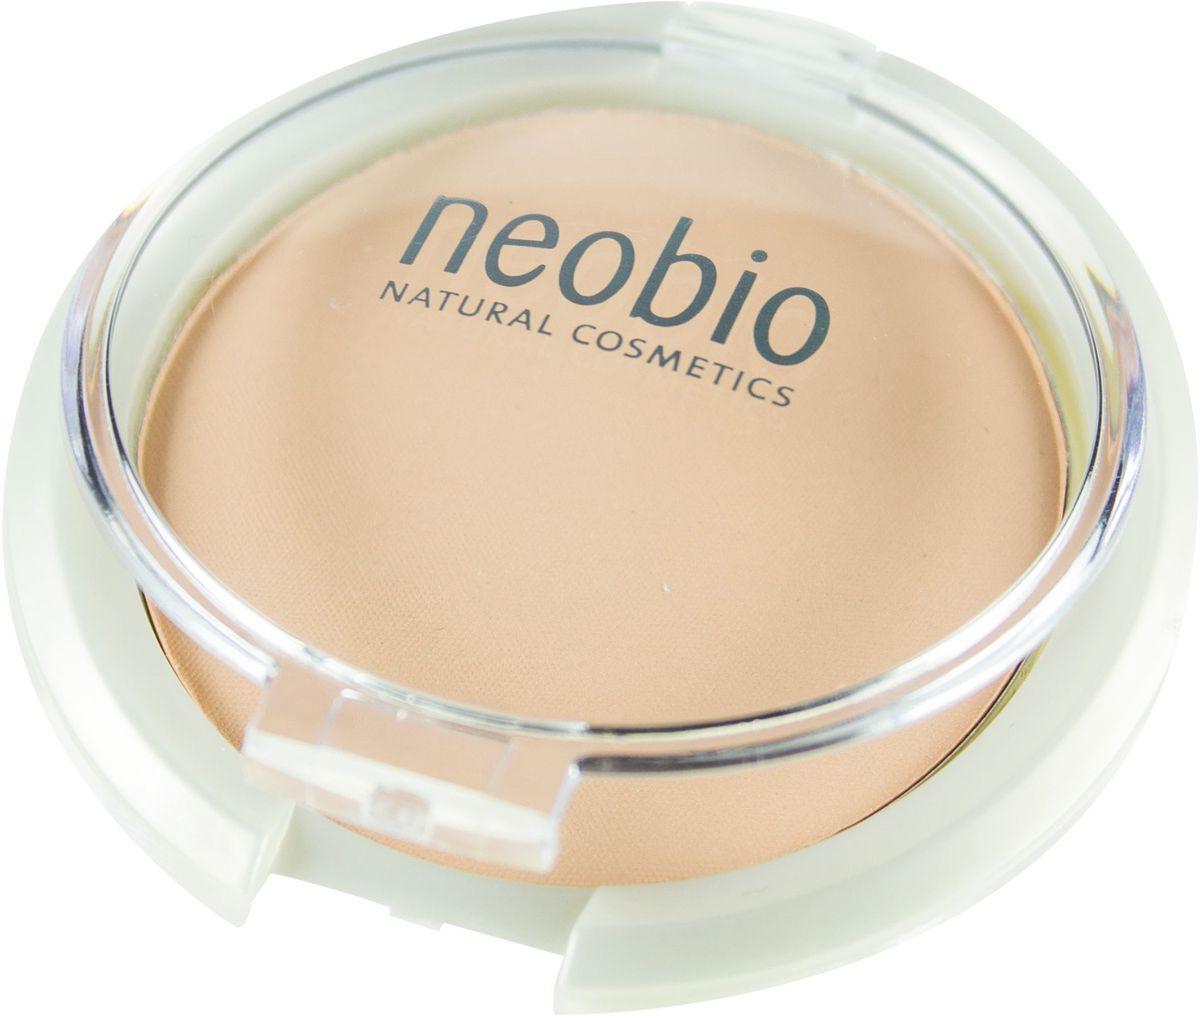 Neobio Компактная пудра, тон № 01 (светло-бежевый), 10 г